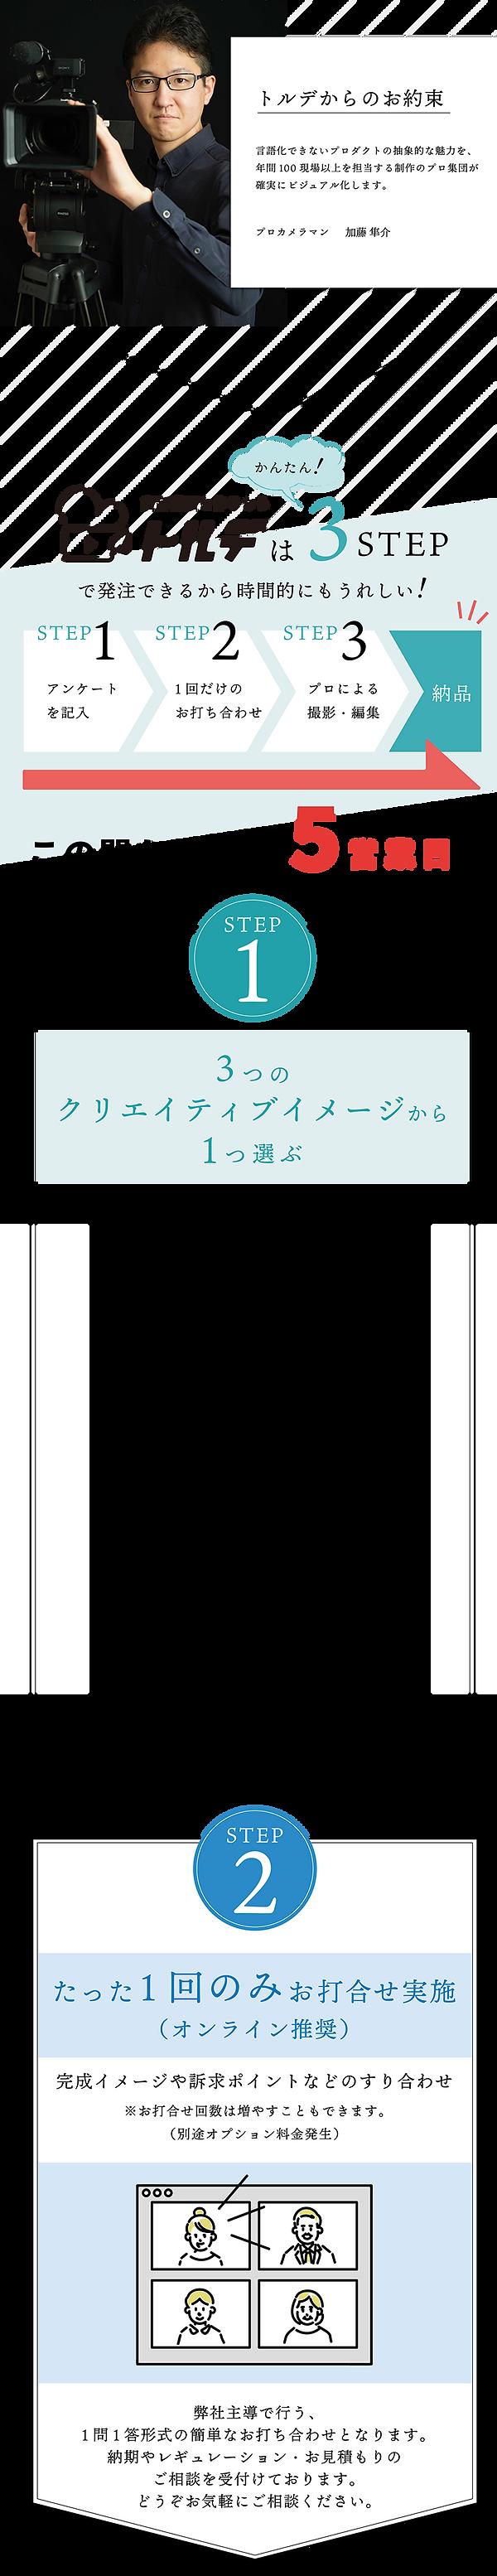 LP_3.png